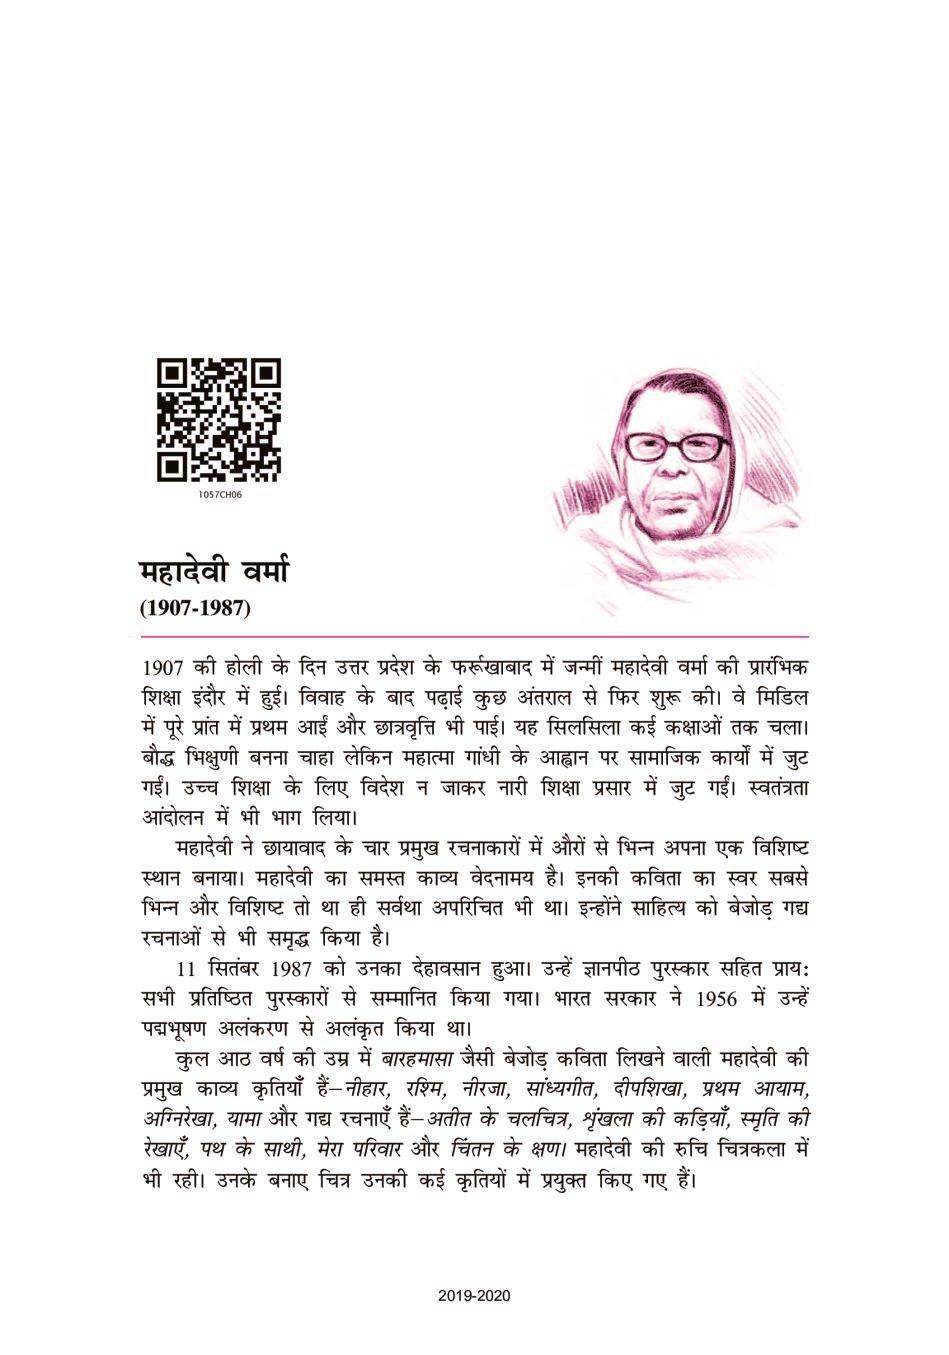 NCERT Book Class 10 Hindi (स्पर्श) Chapter 6 मधुर – मधुर मेरे दीपक जल - Page 1